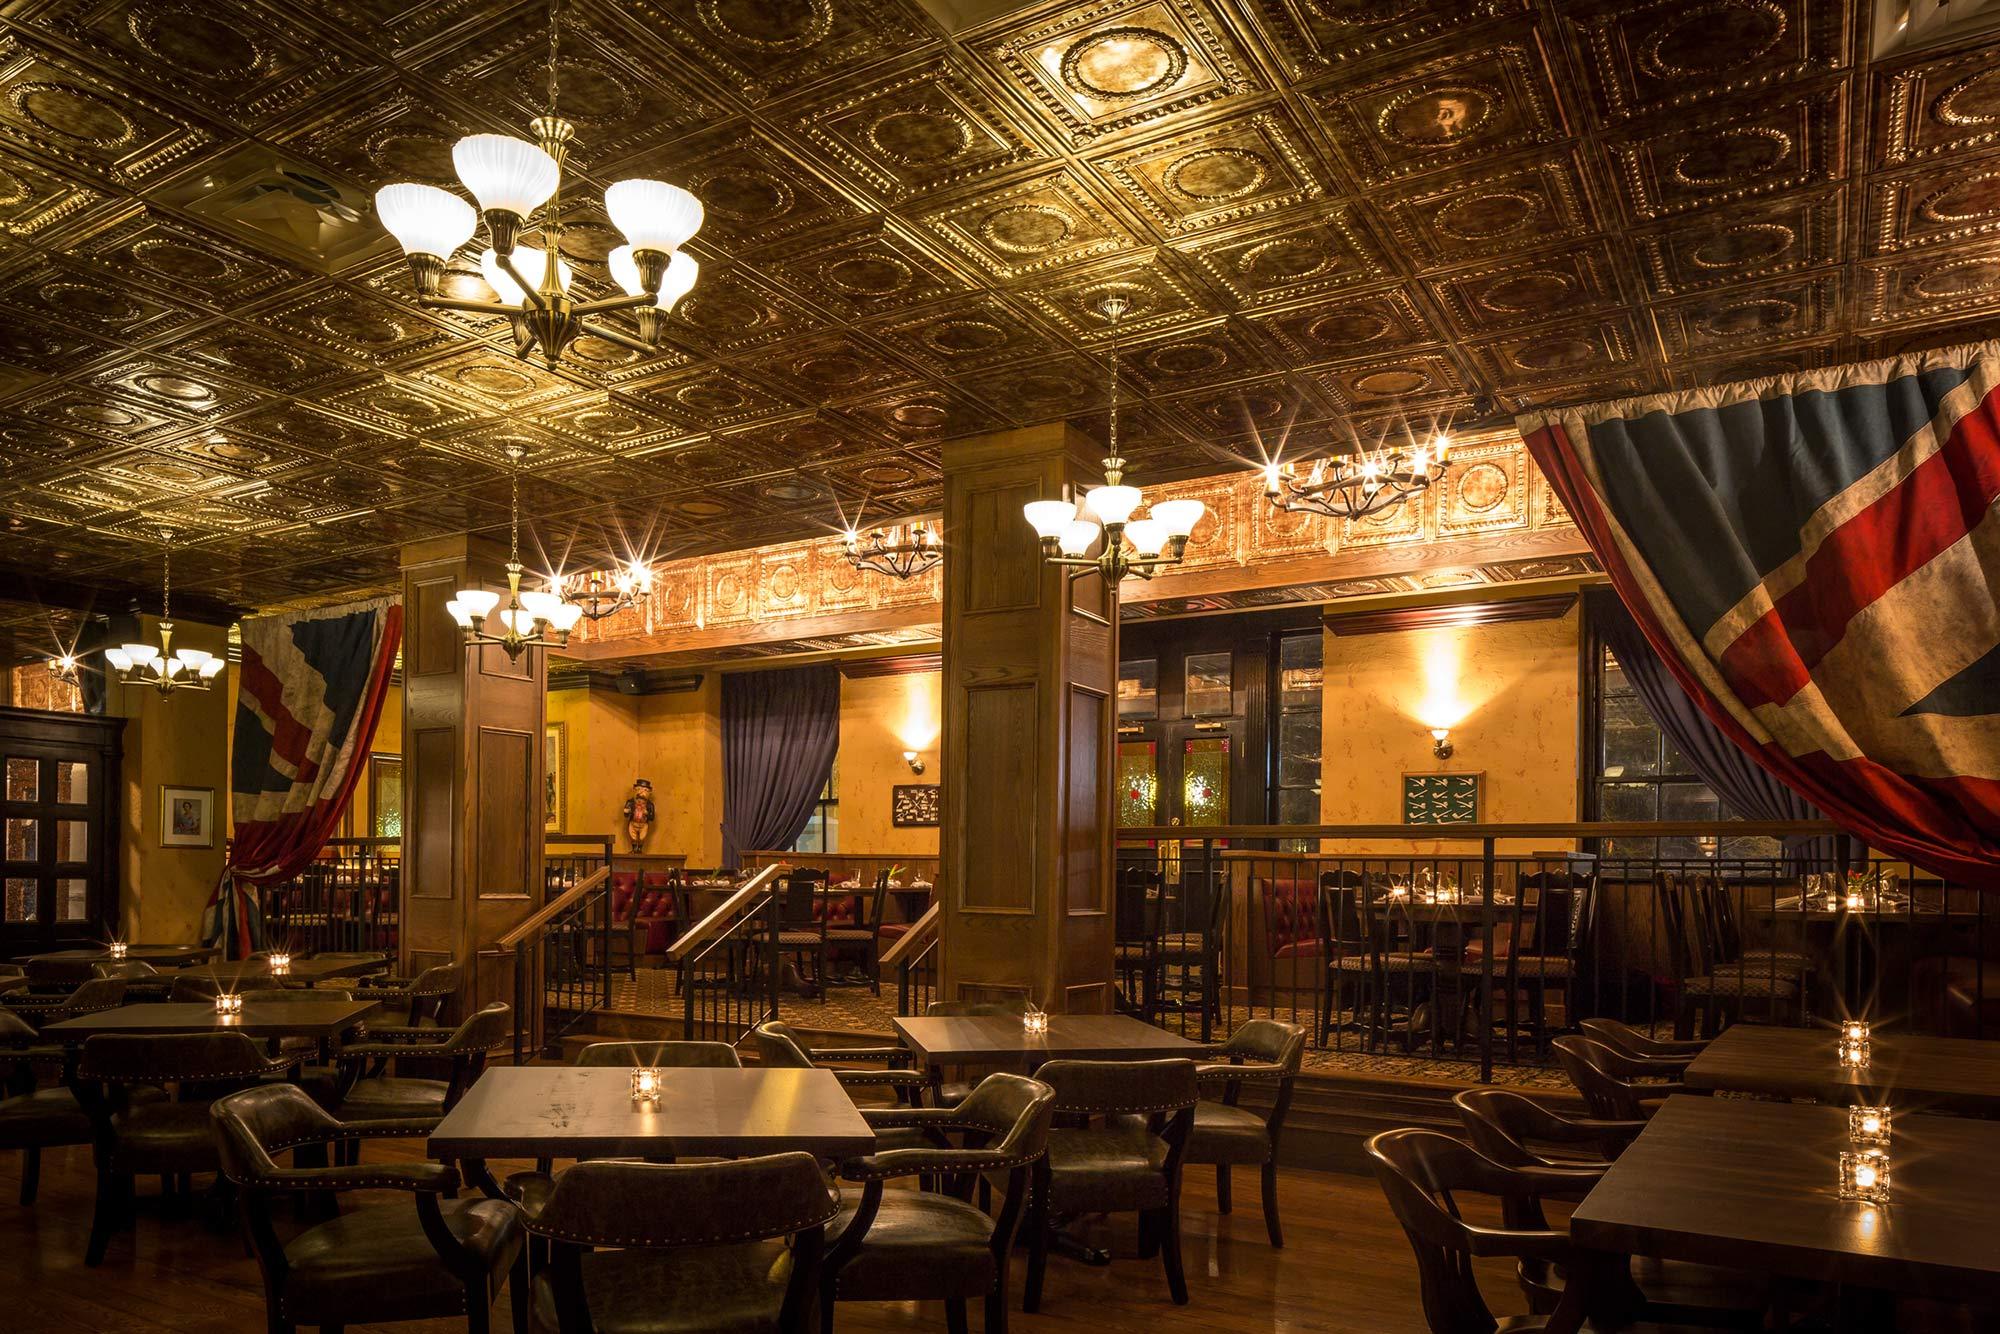 interior-design-restaurant-halifax-dining-room-seating.jpg